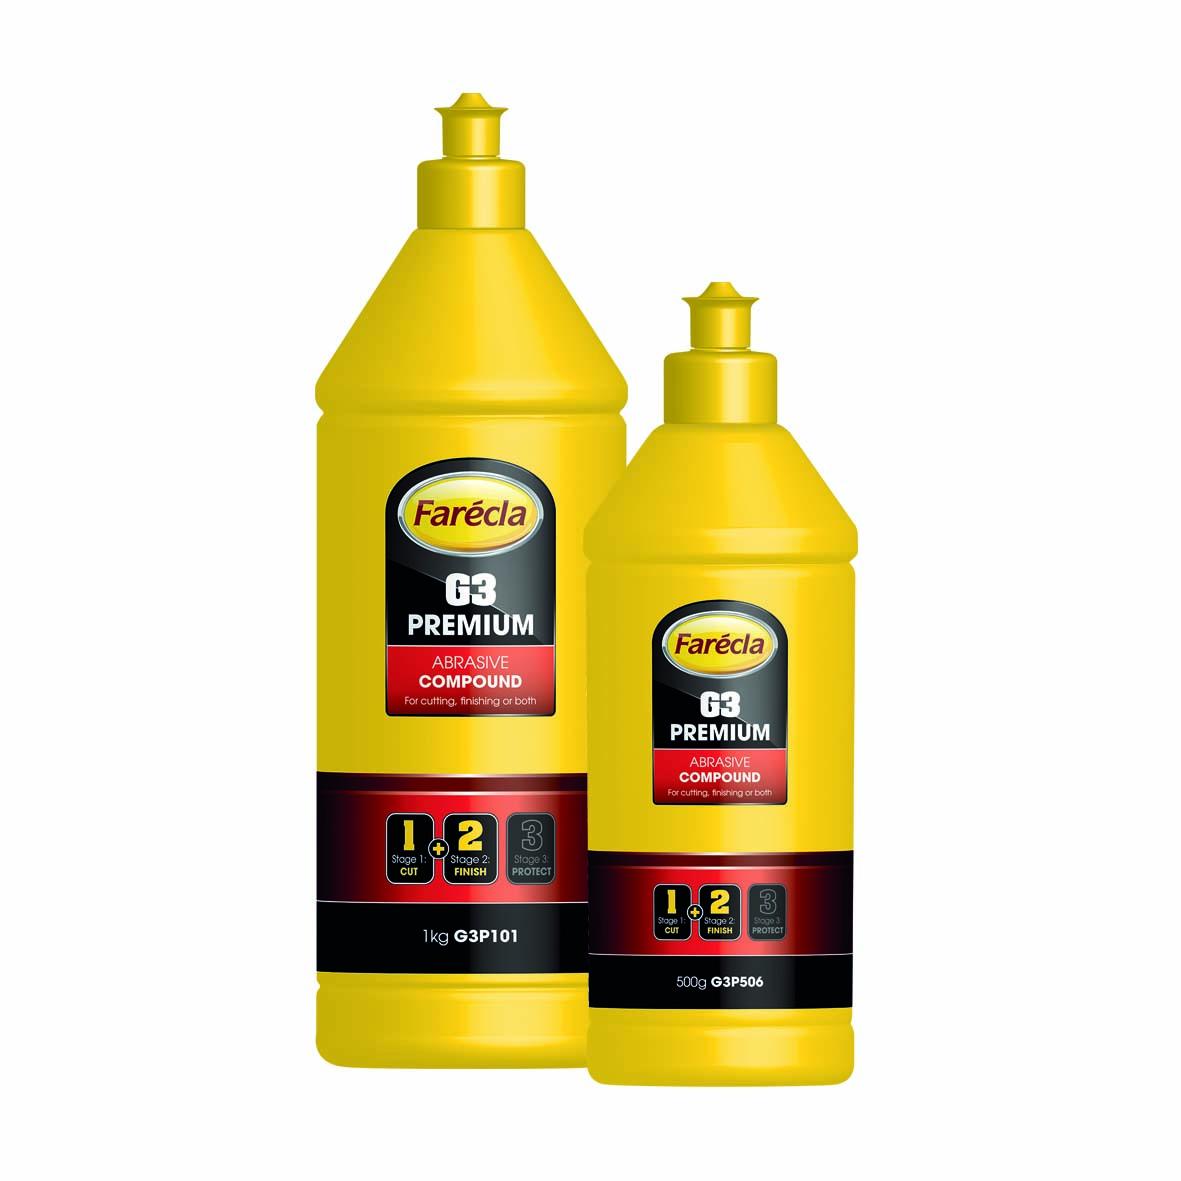 G3 Premium Abrasive Compund